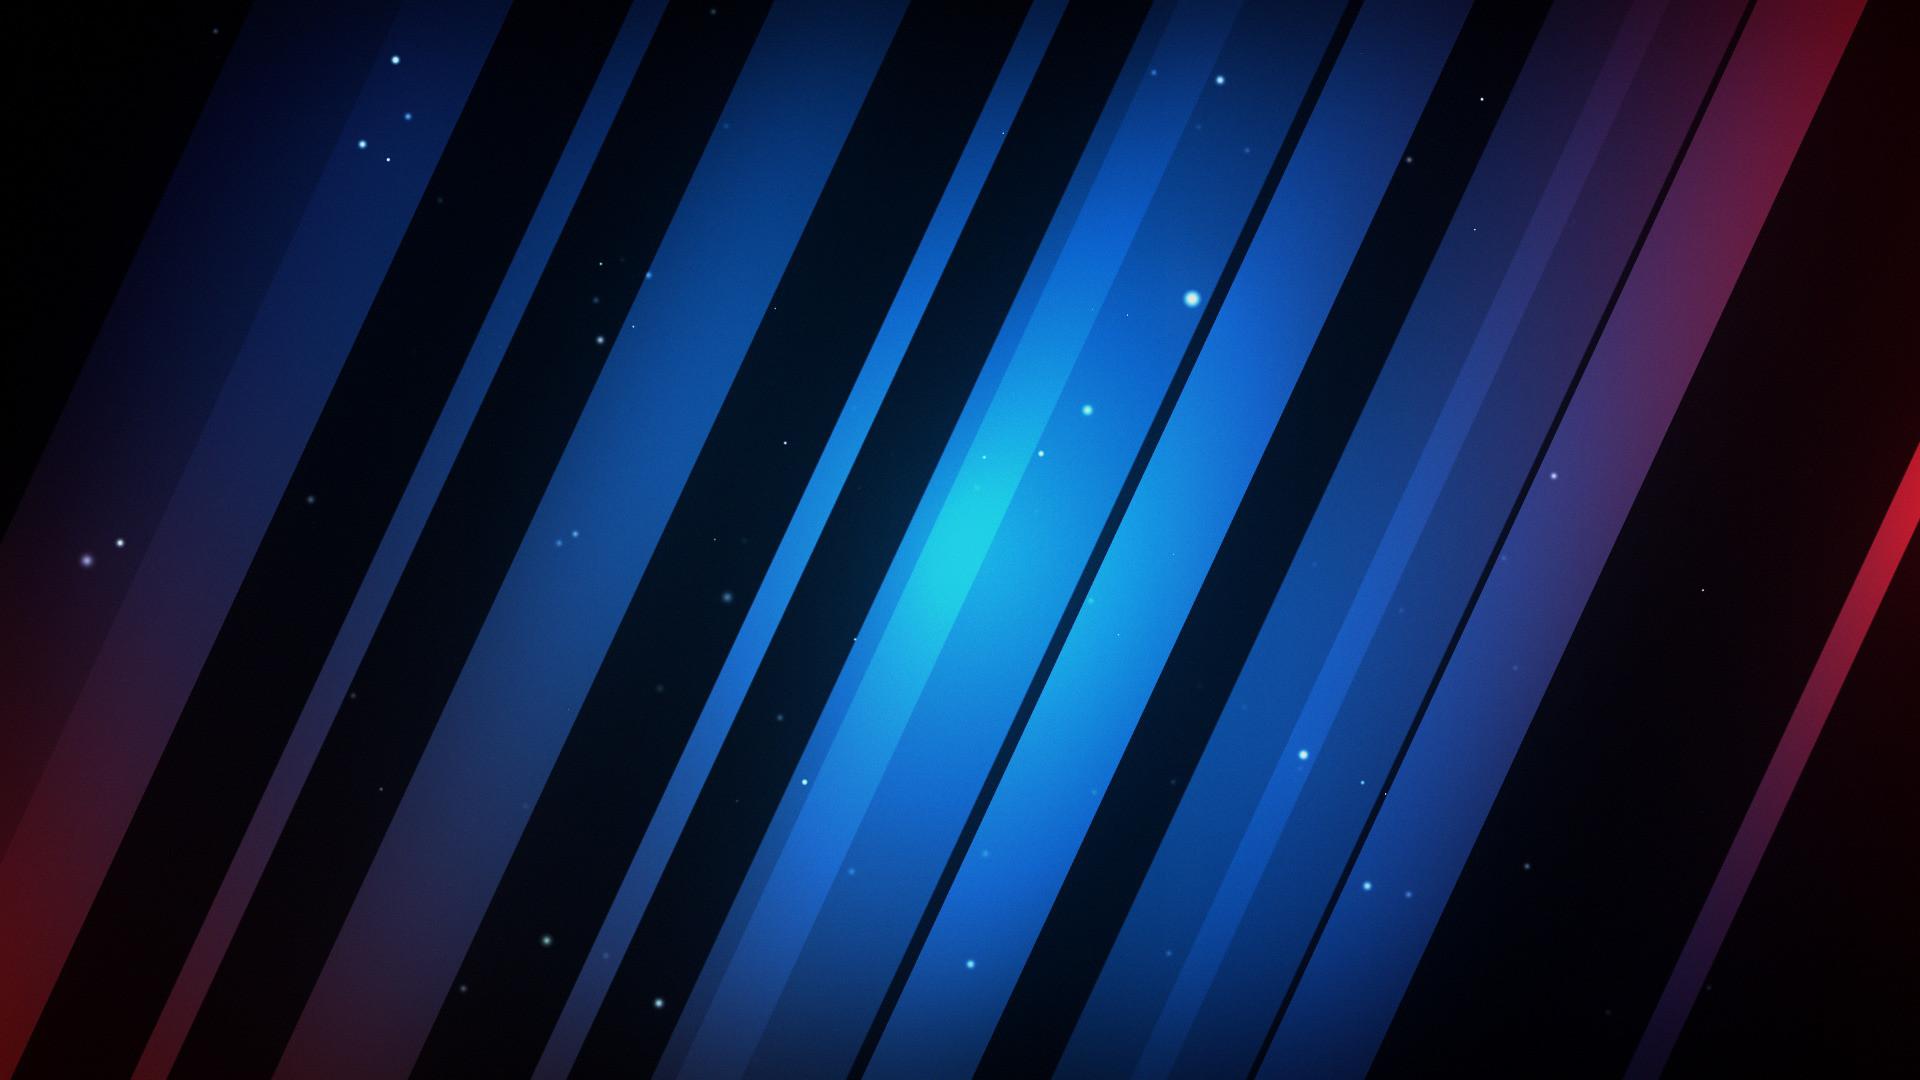 Dark blue stripes